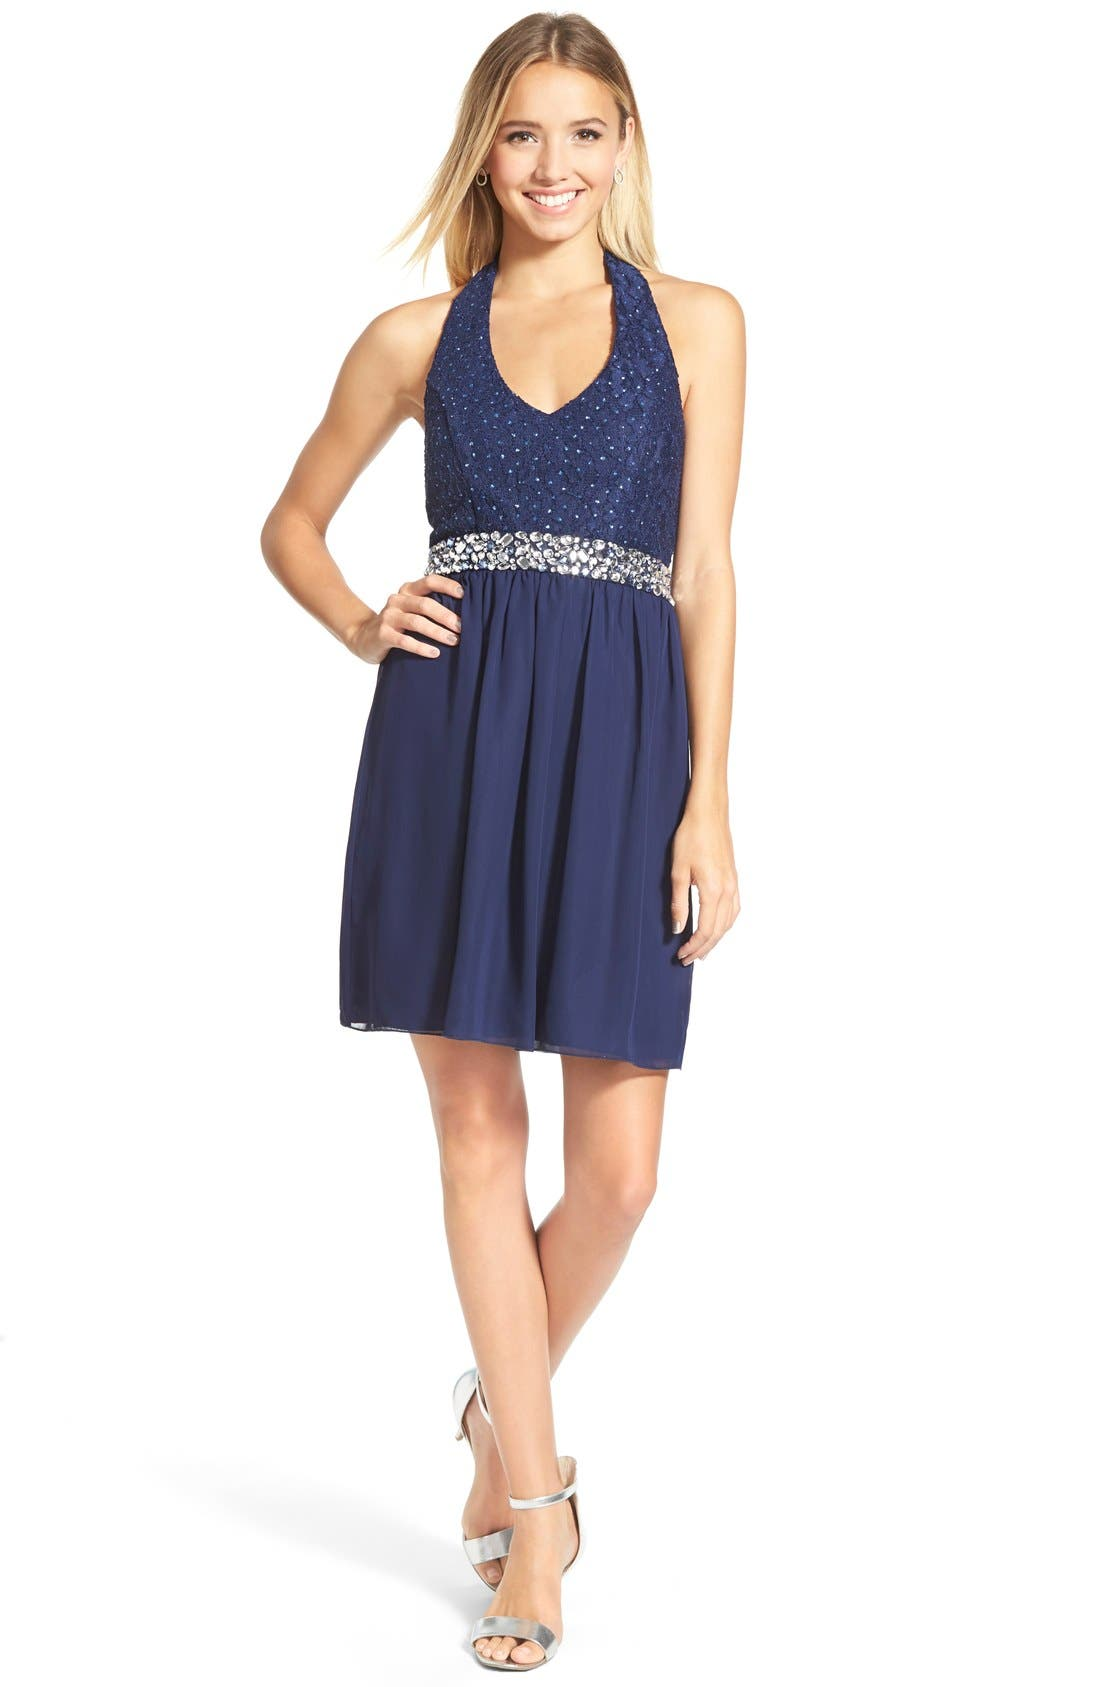 Alternate Image 1 Selected - Speechless Bow Back Lace Halter Dress